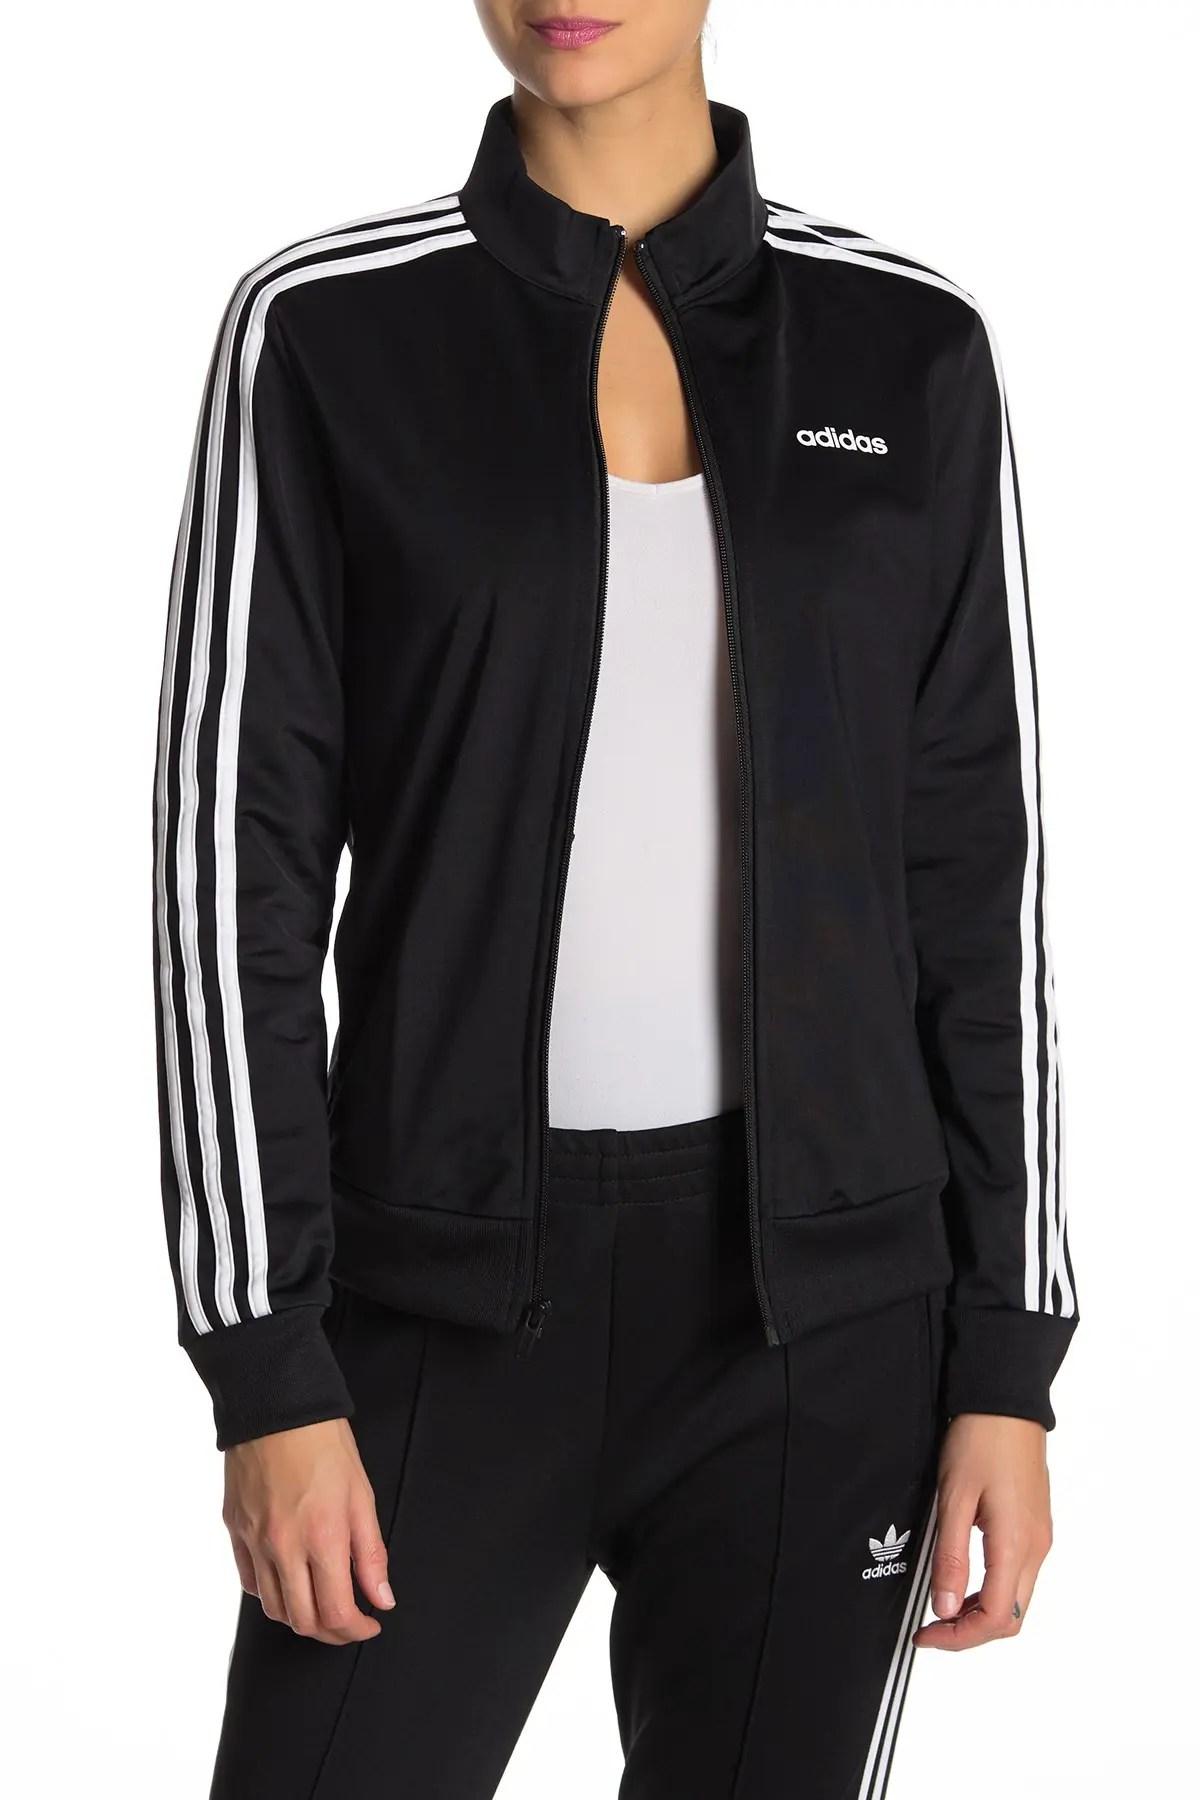 adidas women s sweatshirts hoodies